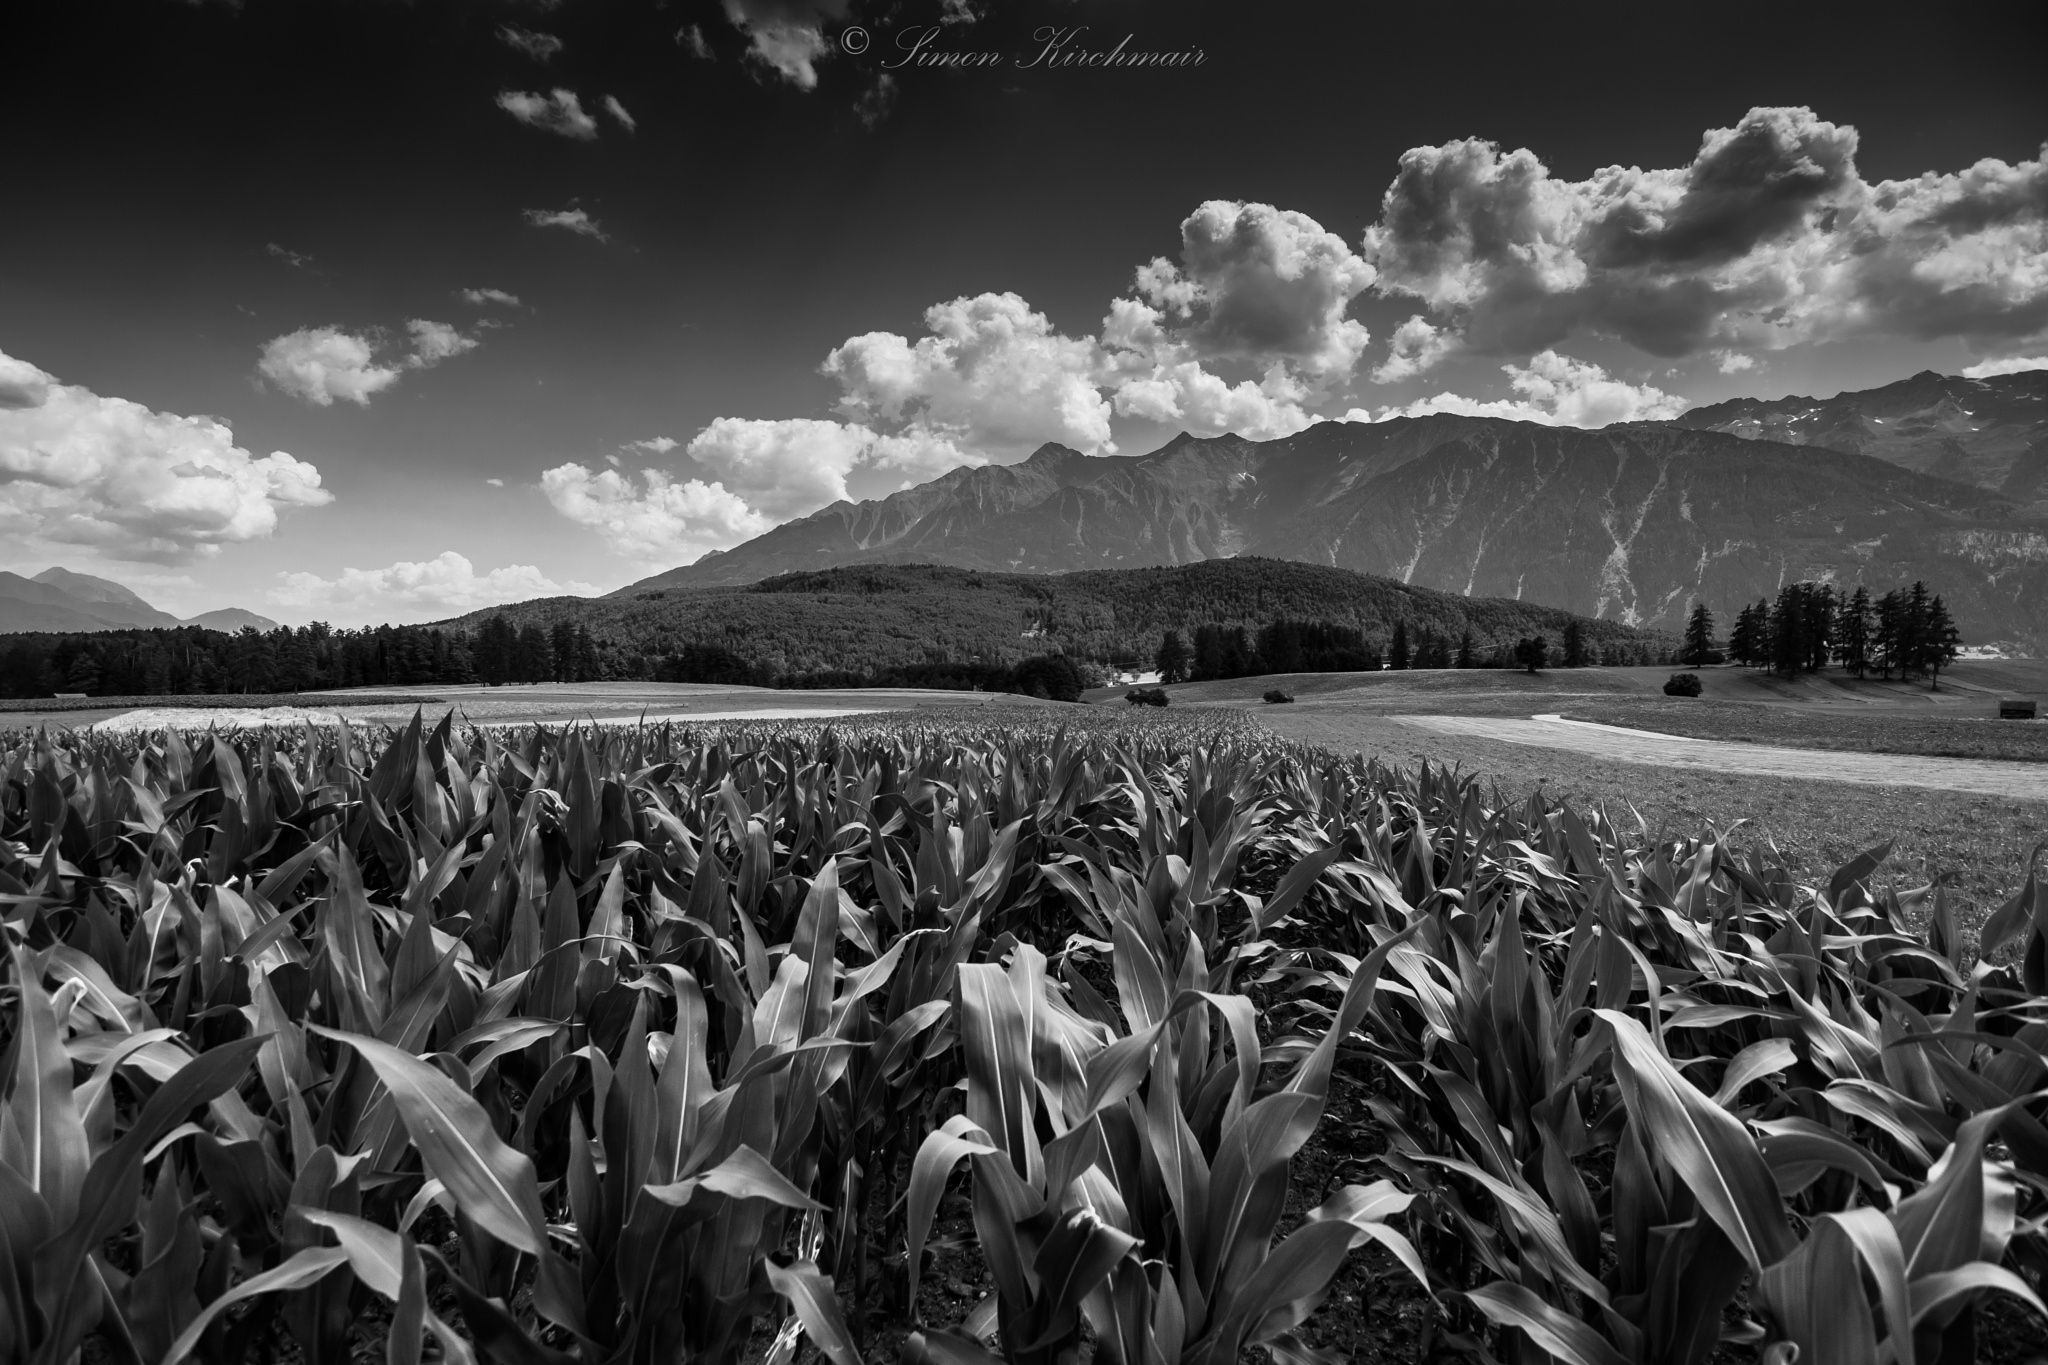 Photograph corn field by Simon Kirchmair on 500px